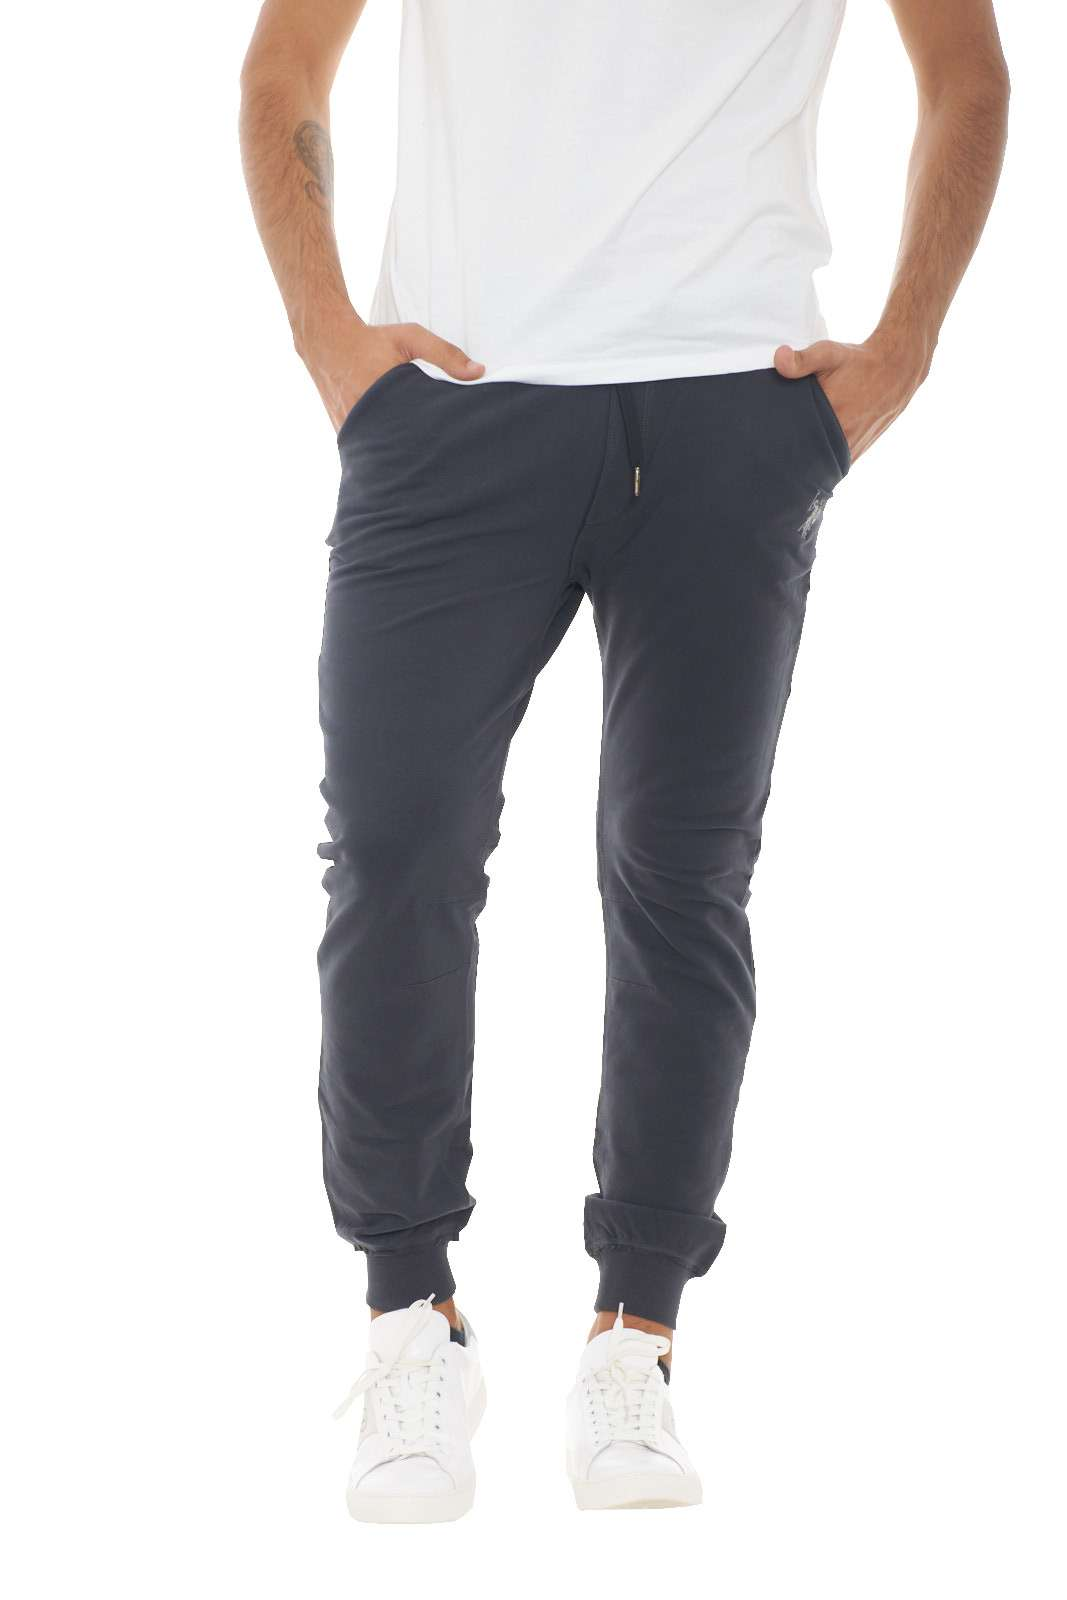 https://www.parmax.com/media/catalog/product/a/i/AI-outlet_parmax-pantaloni-uomo-Us-Polo-43300-A.jpg